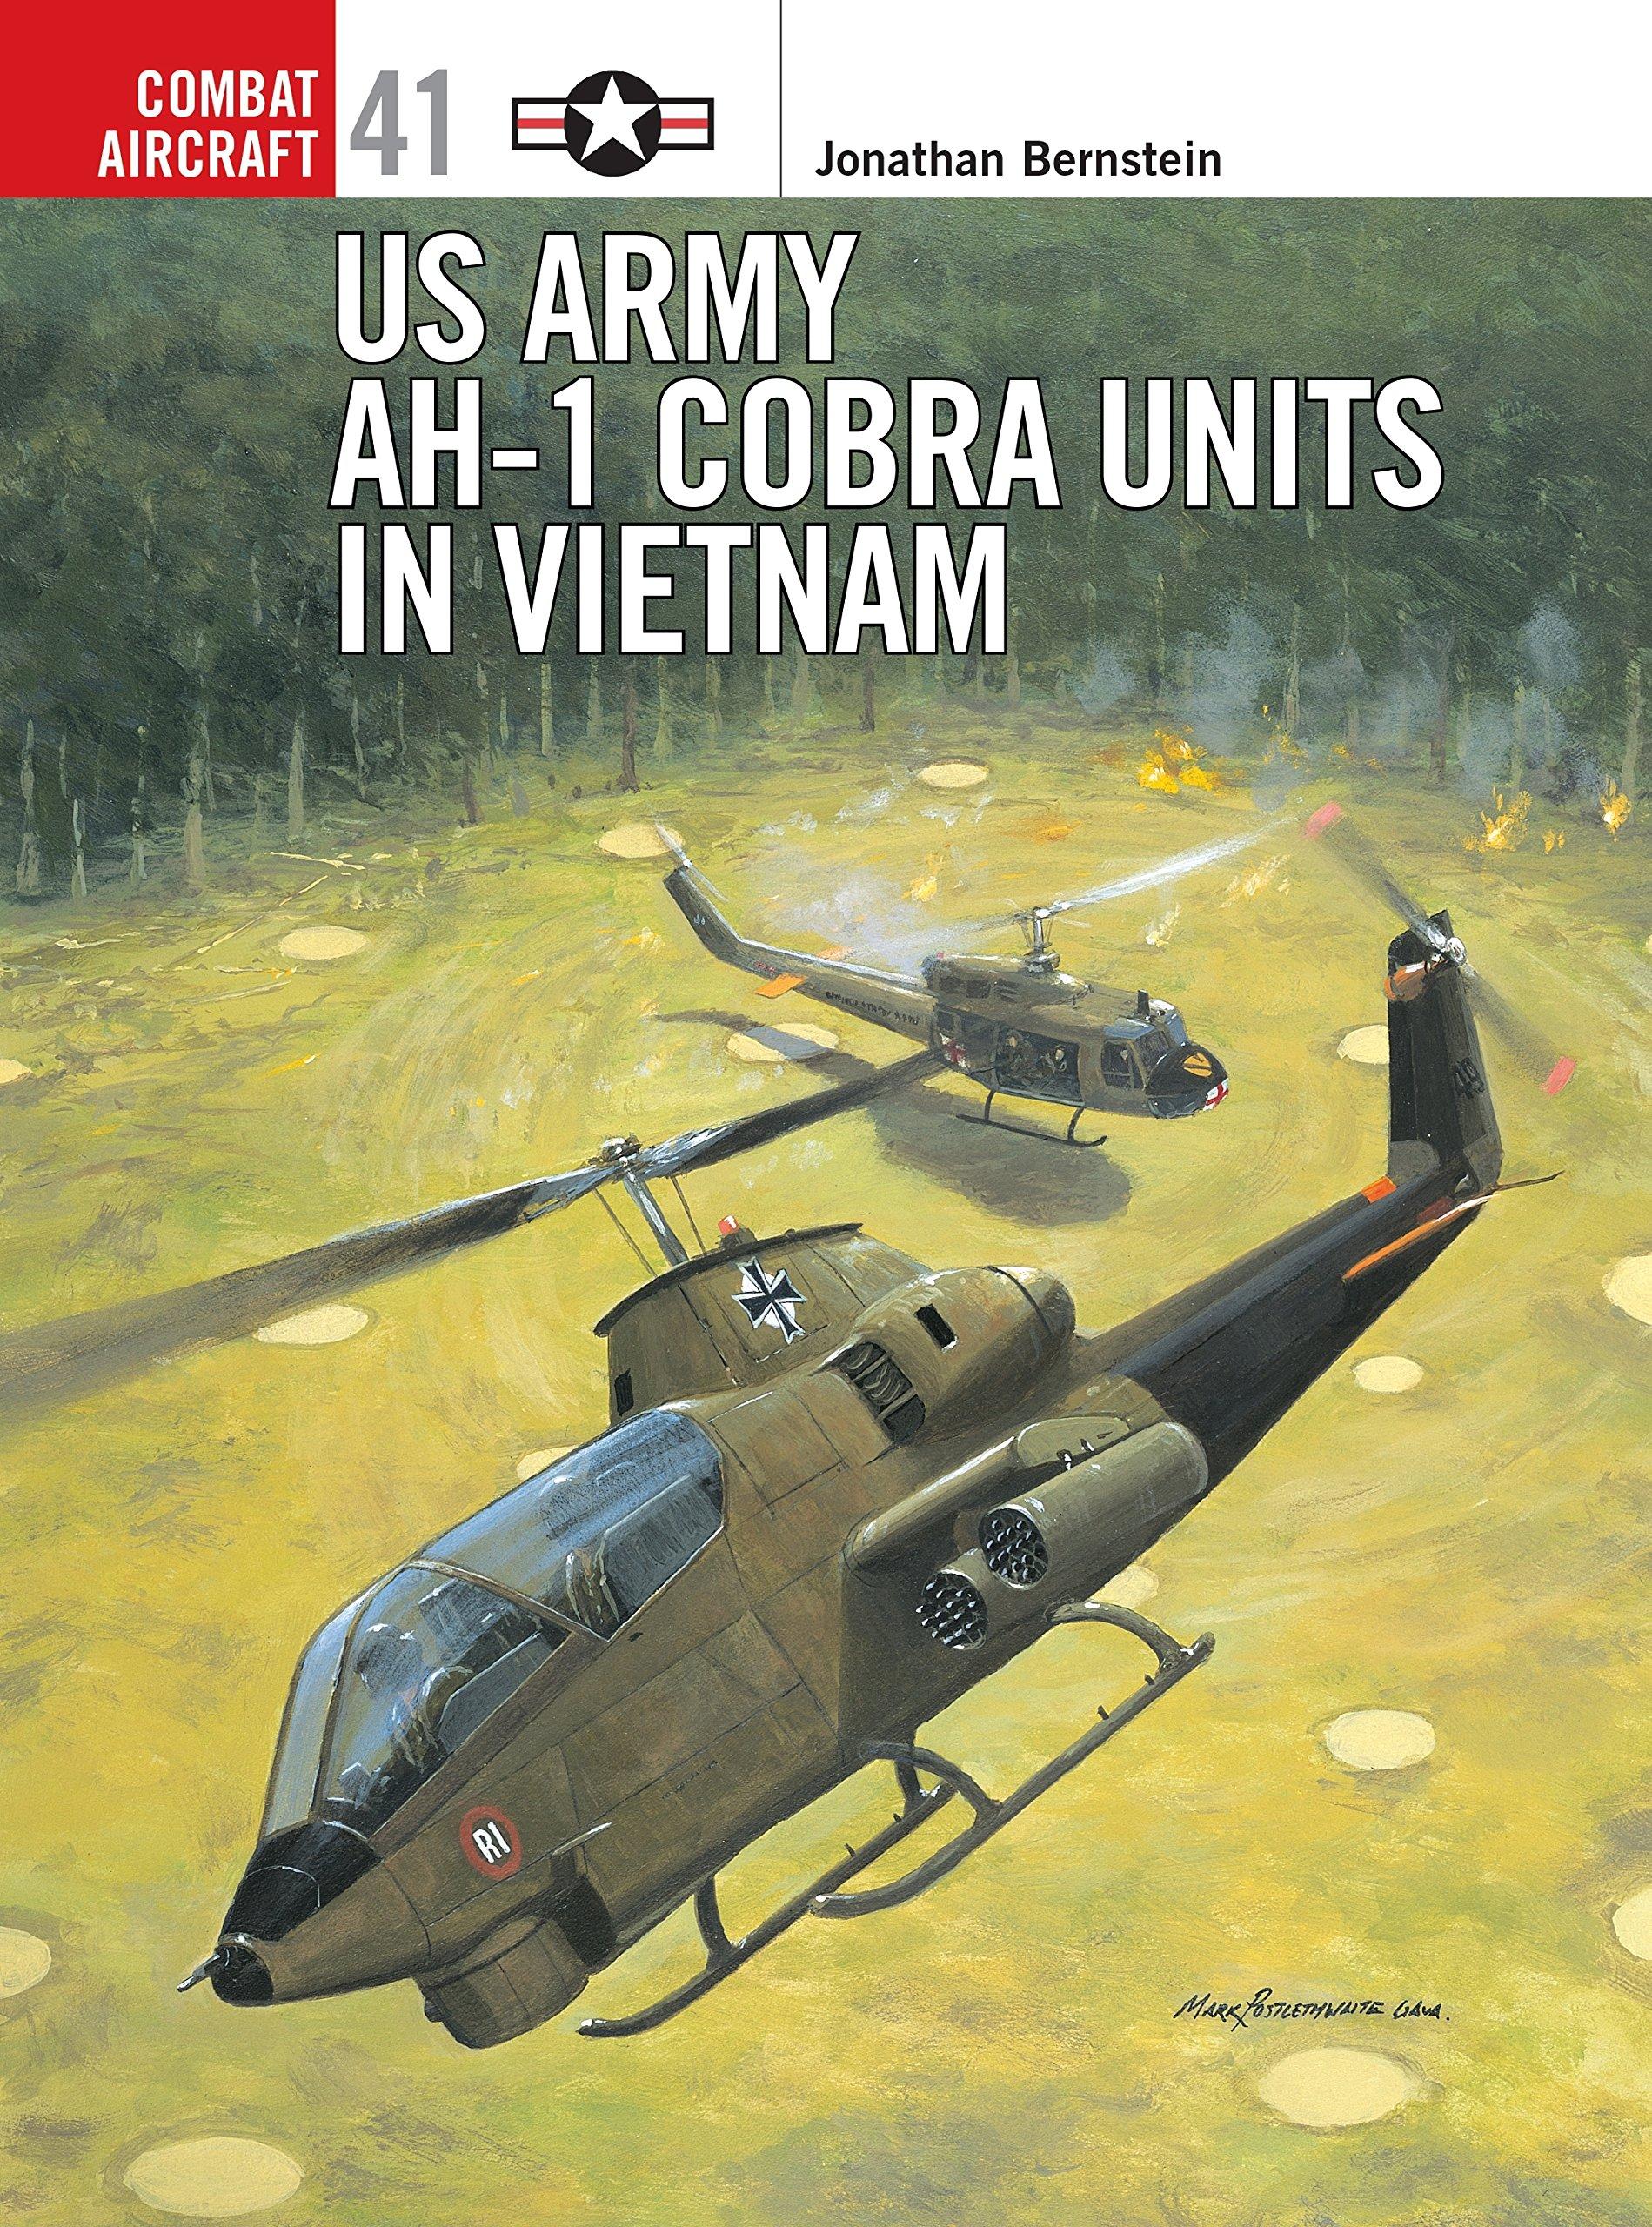 by Jim Laurier AH1 Cobra Aviation Art Snake Attack